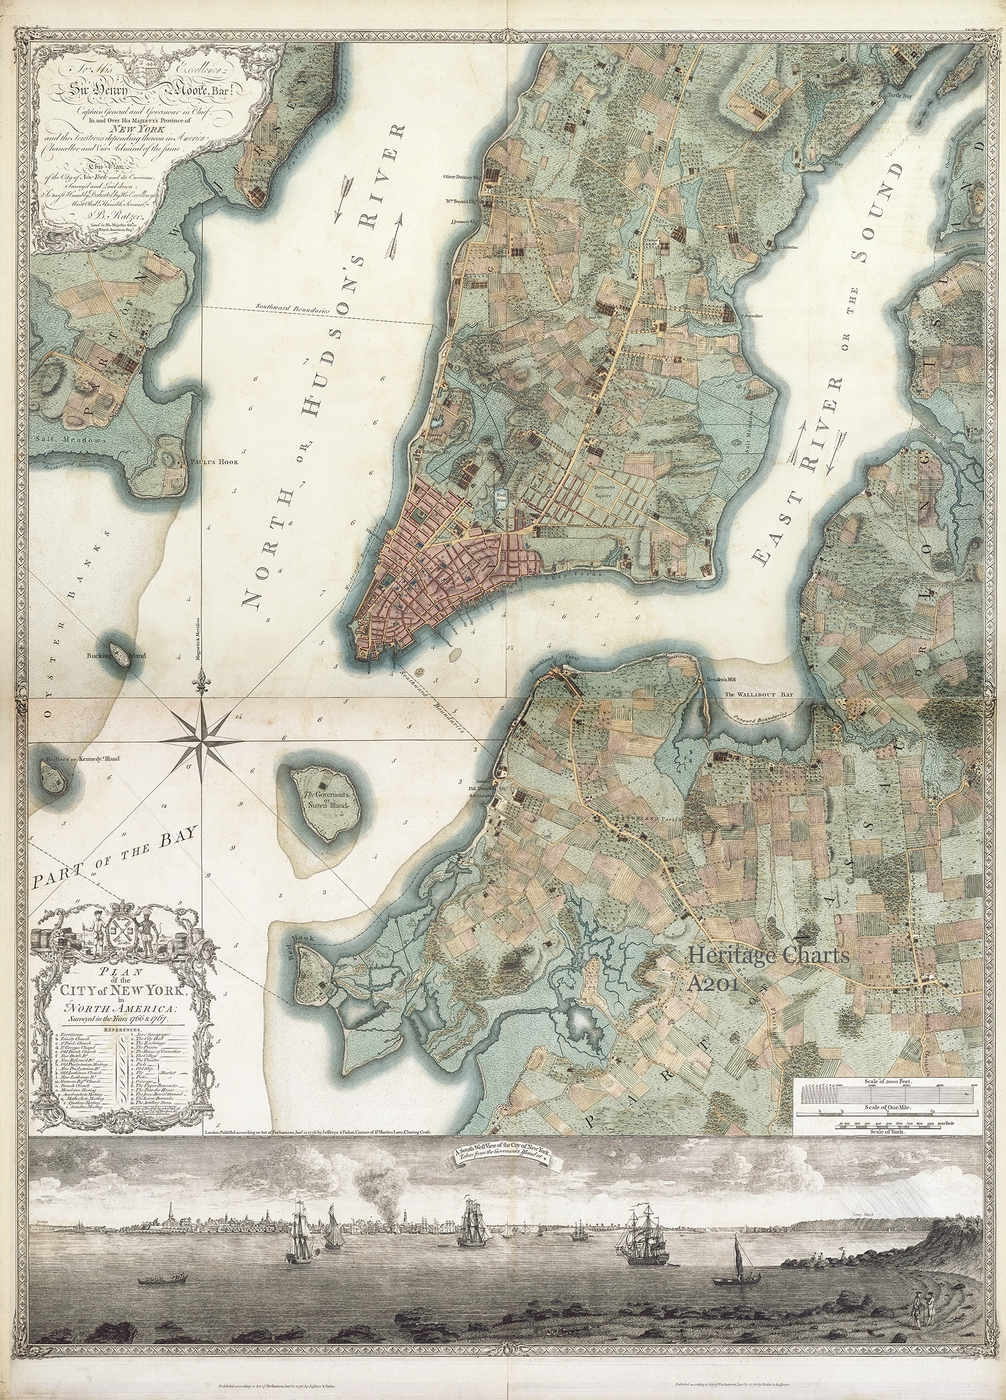 [history] [map] [new york]